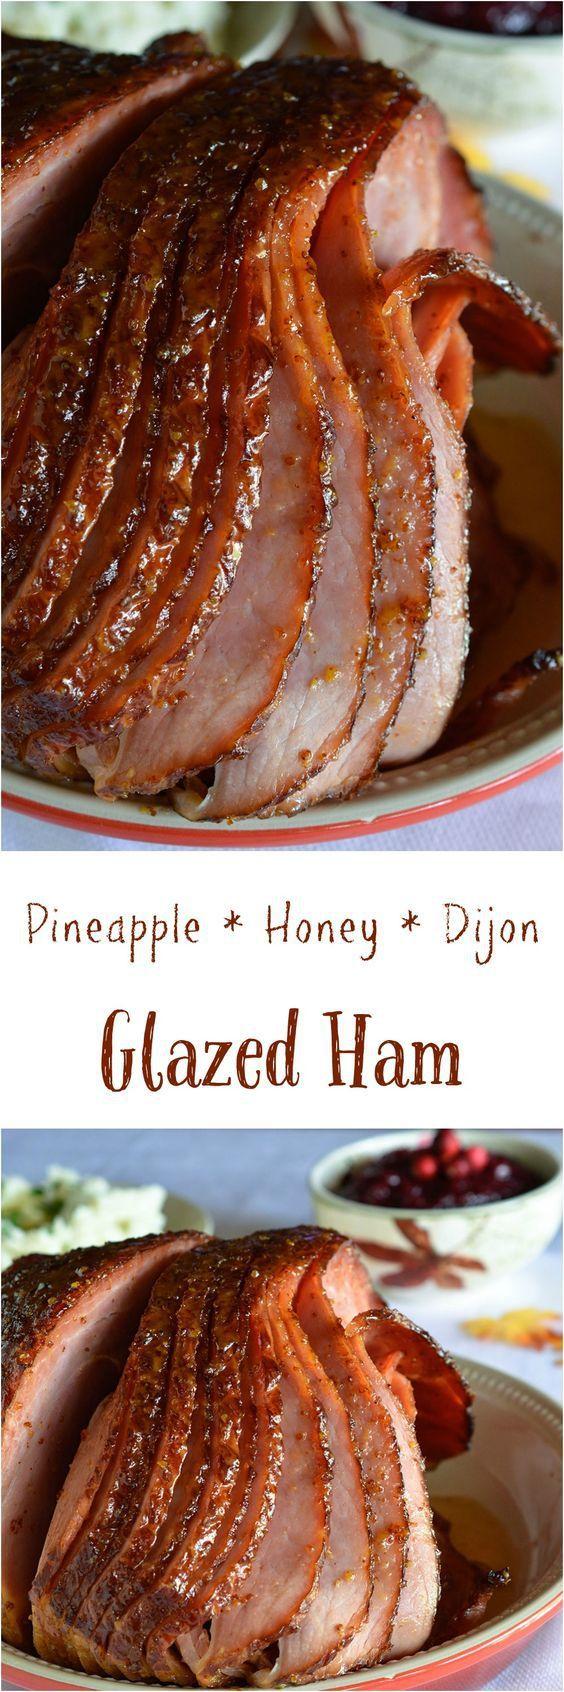 ... Pork, Ham on Pinterest | Honey glazed ham, Spiral ham and Face down